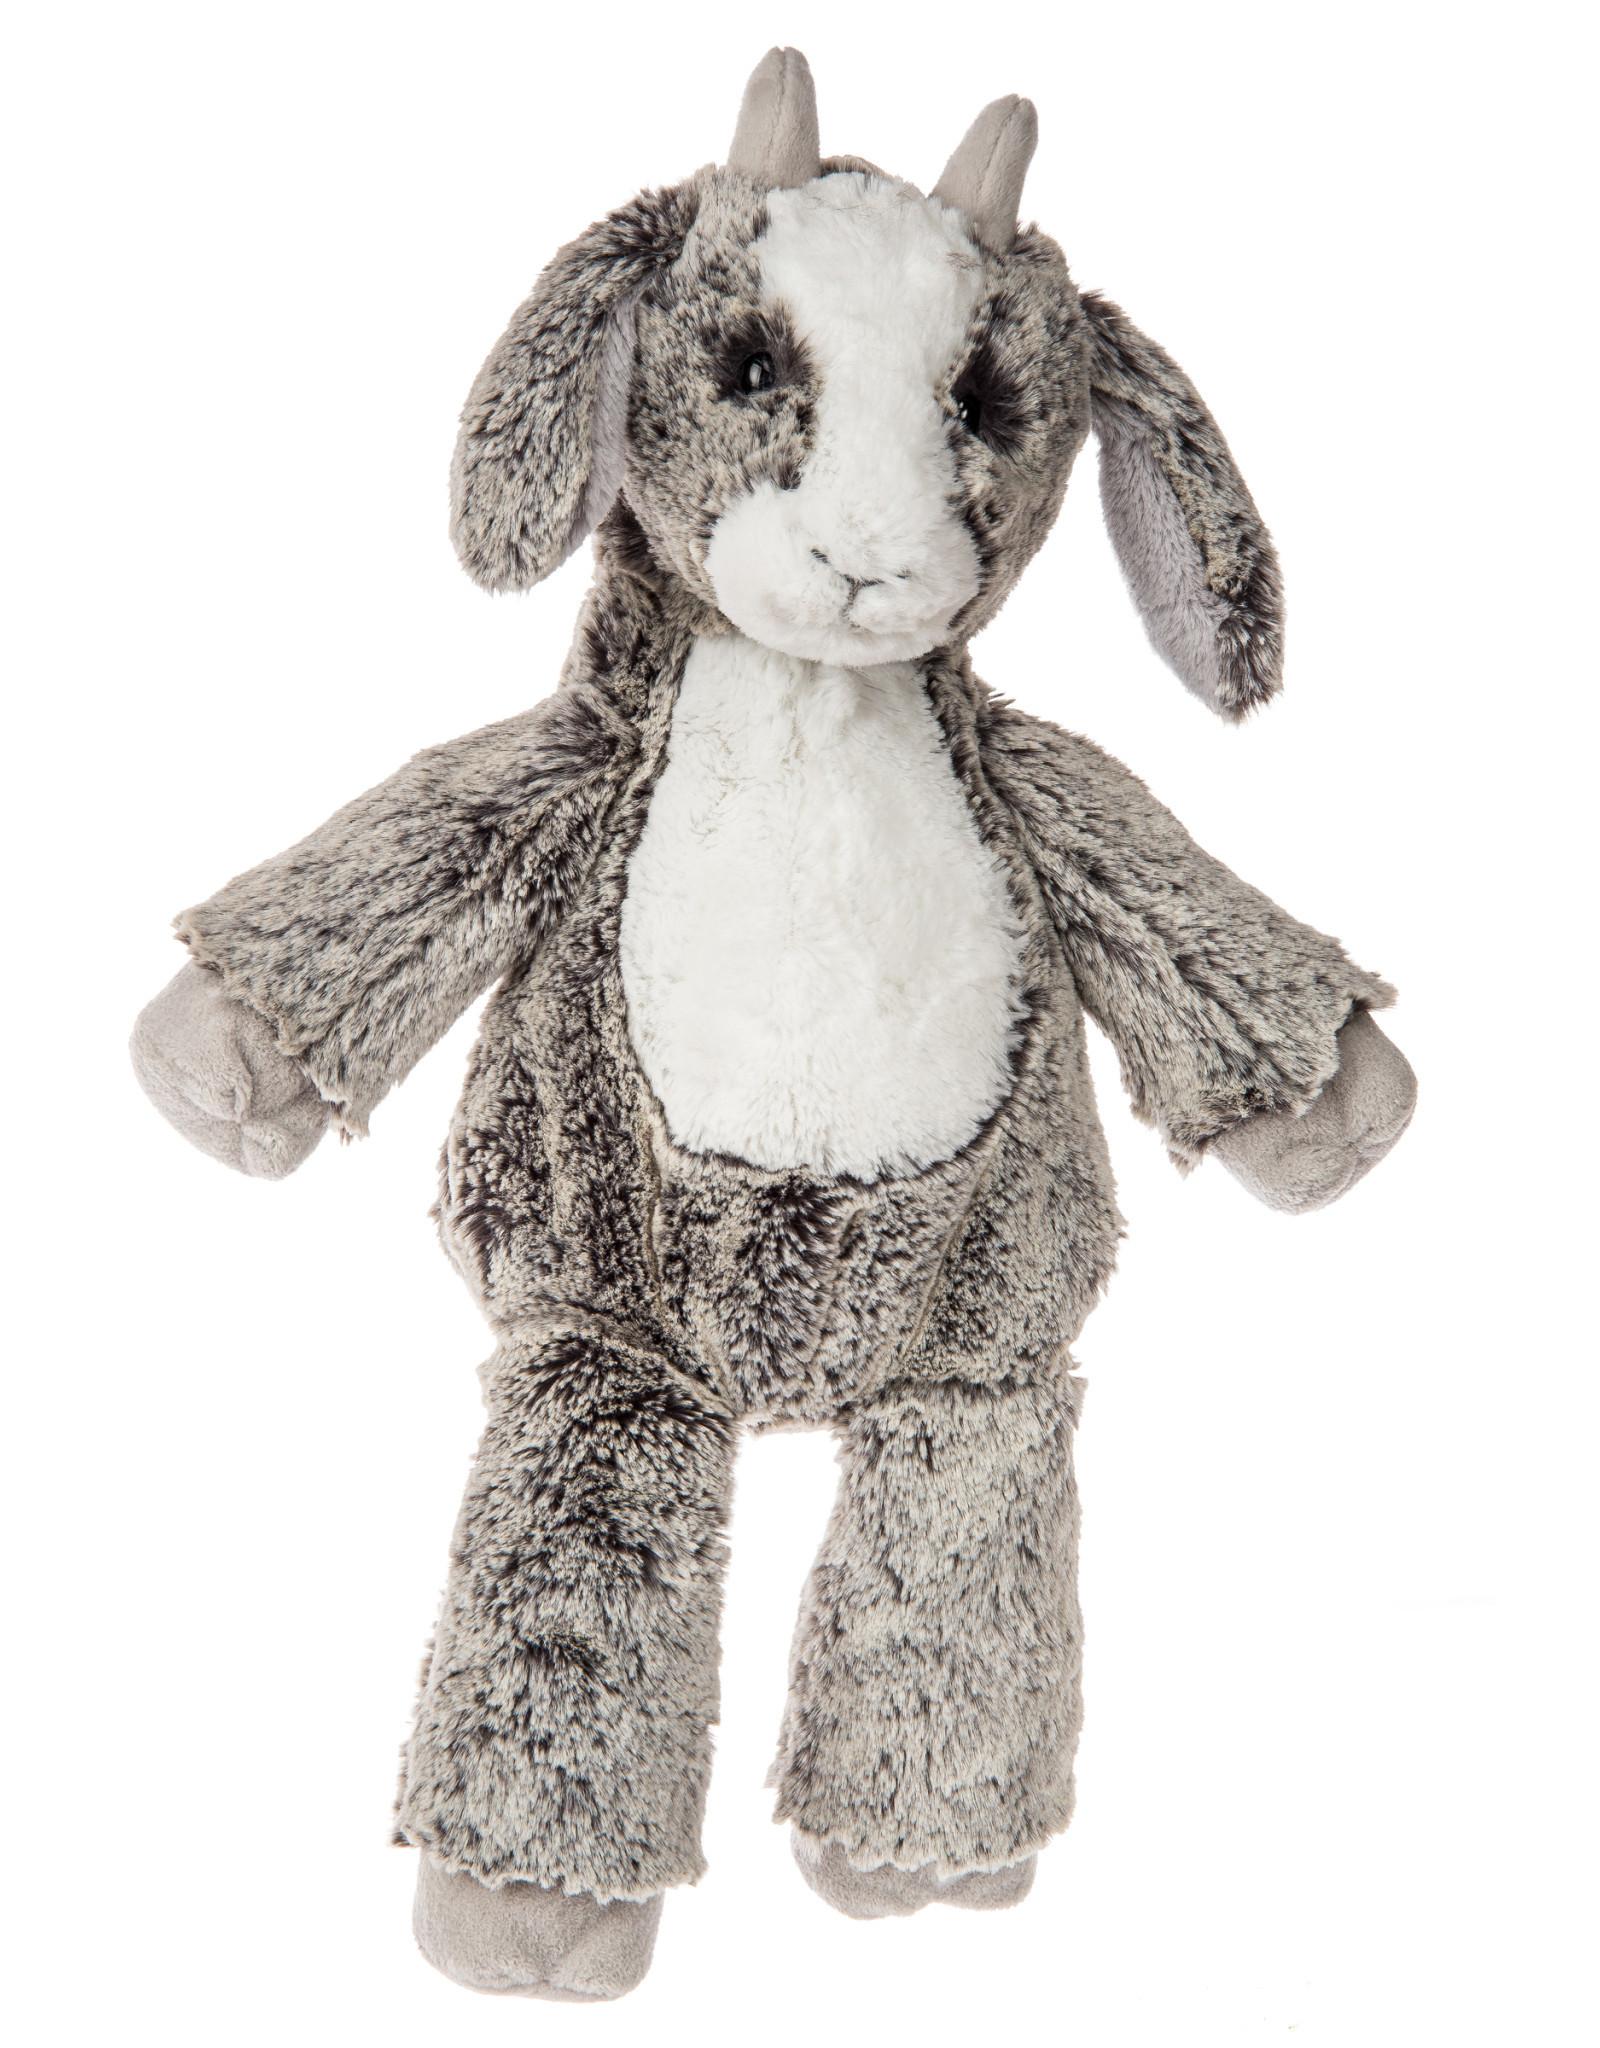 Marshmallow Goat